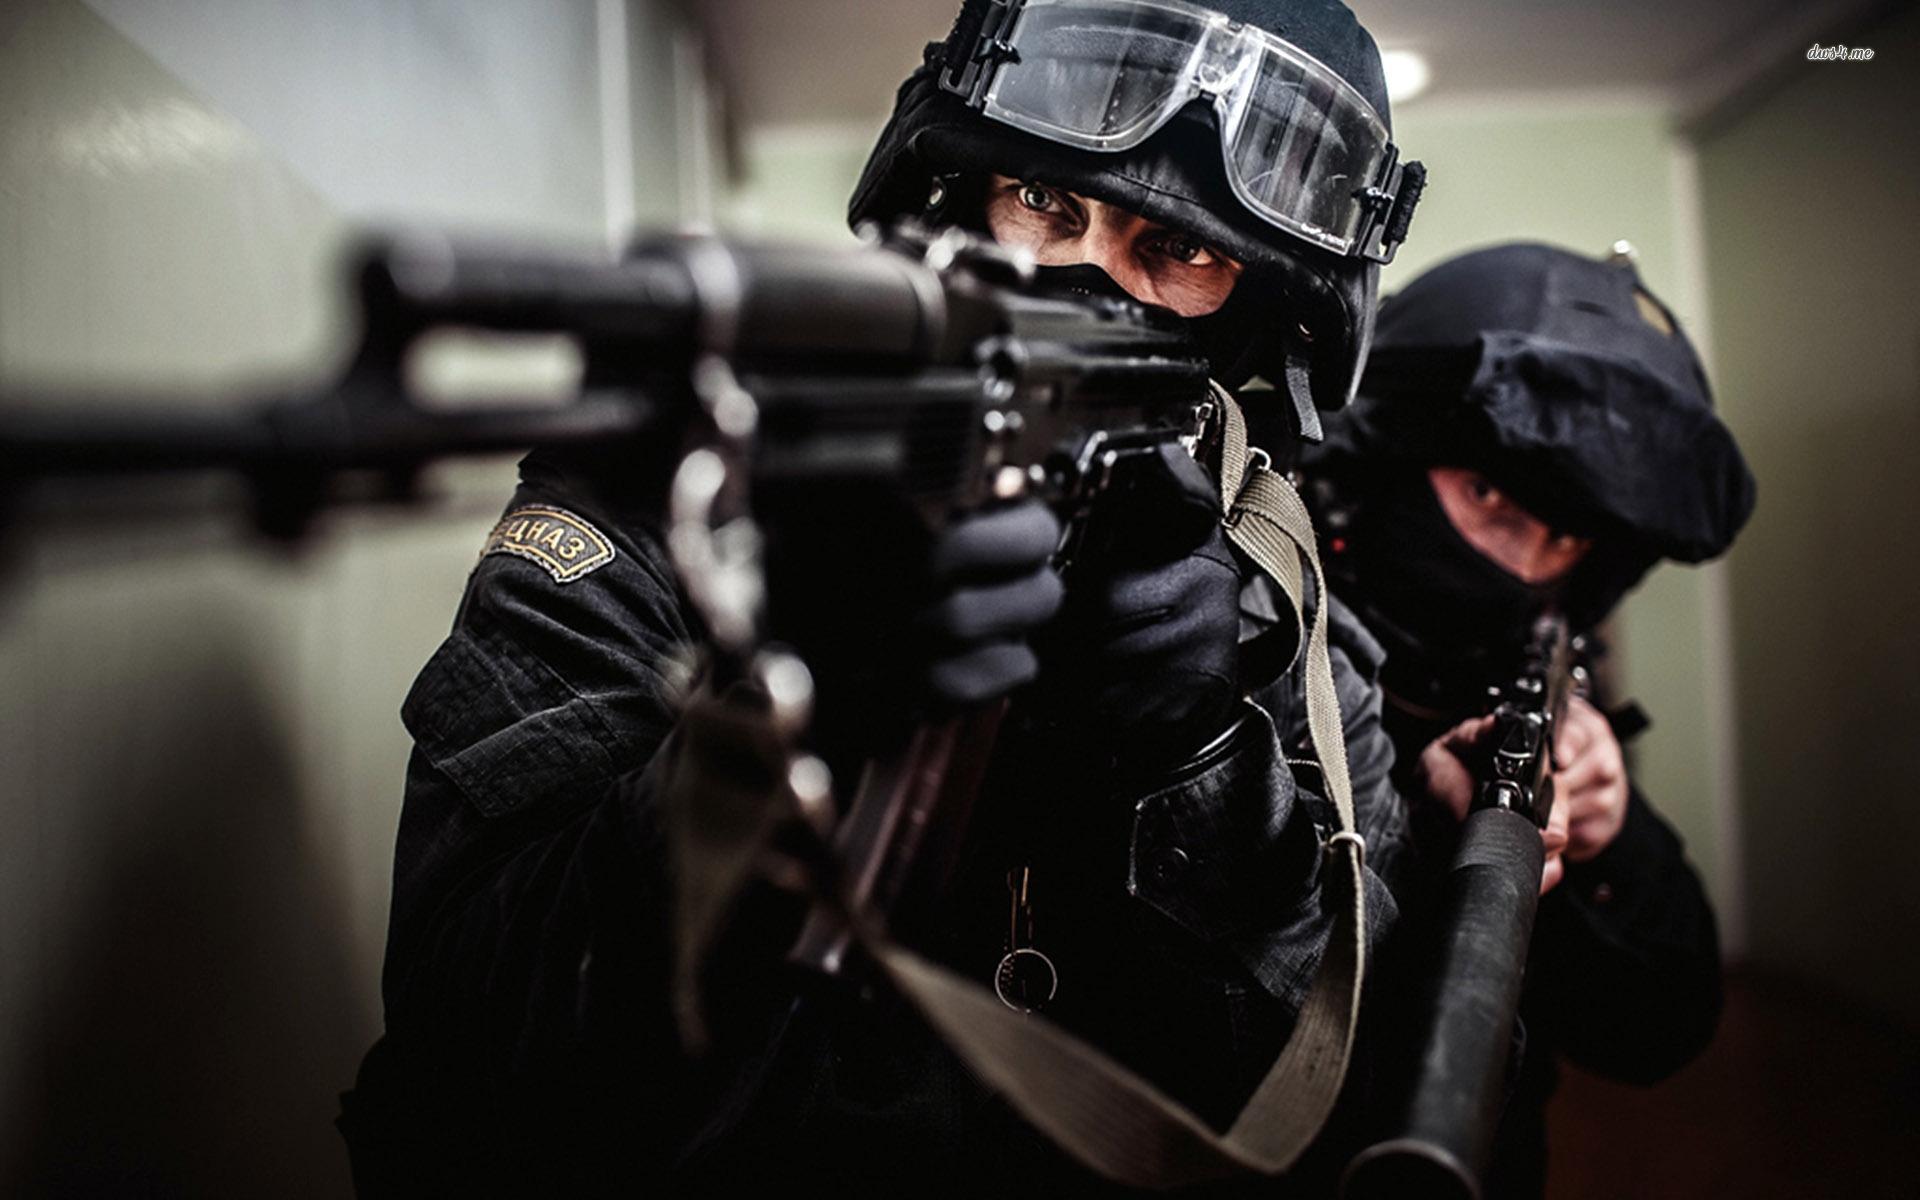 6195-swat-team-wallpaper-hd-free-download